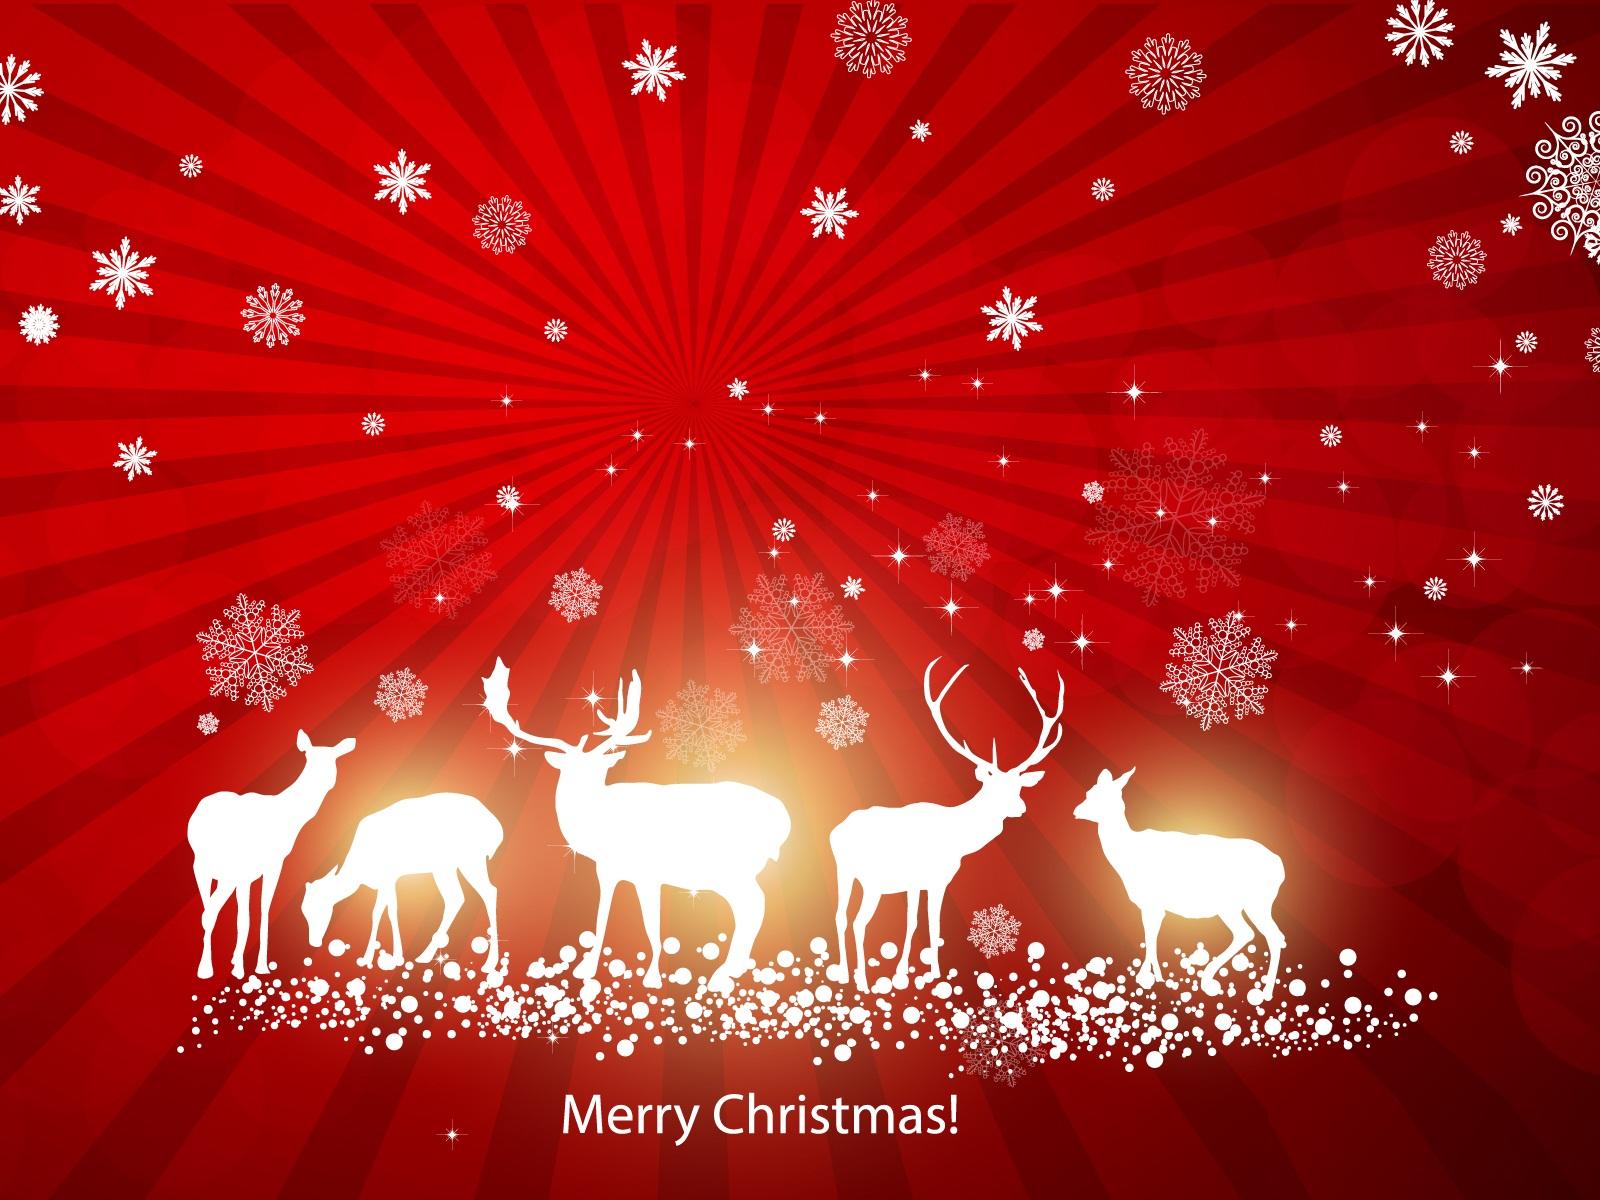 christmas screensavers and wallpaper 2015   Grasscloth Wallpaper 1600x1200